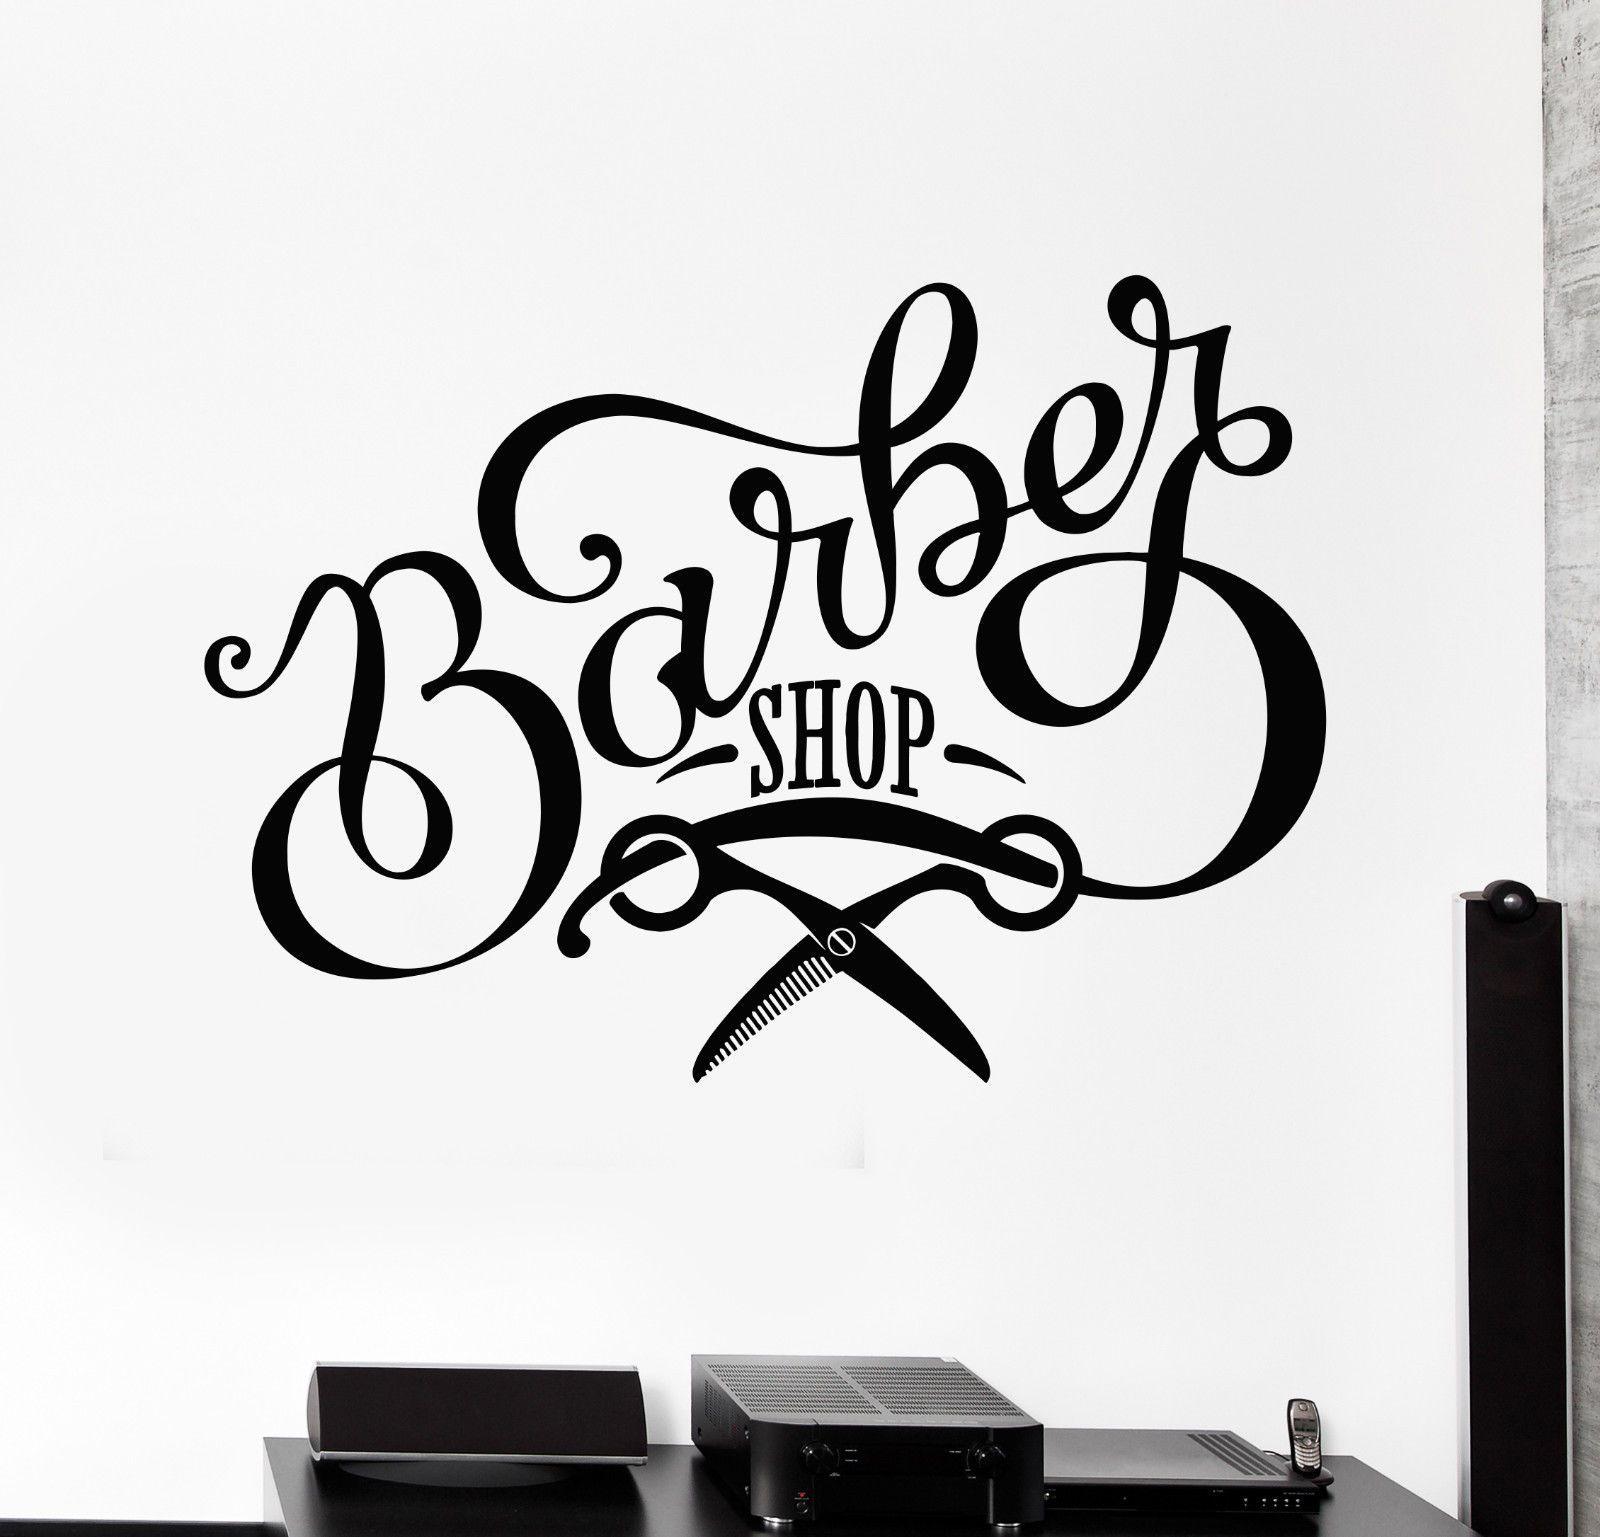 Vinyl Wall Decal Barbershop Scissors Signboard Beauty Hair Salon Stickers 1456ig Ebay In 2021 Barber Shop Hair And Beauty Salon Vinyl Wall Decals [ 1537 x 1600 Pixel ]